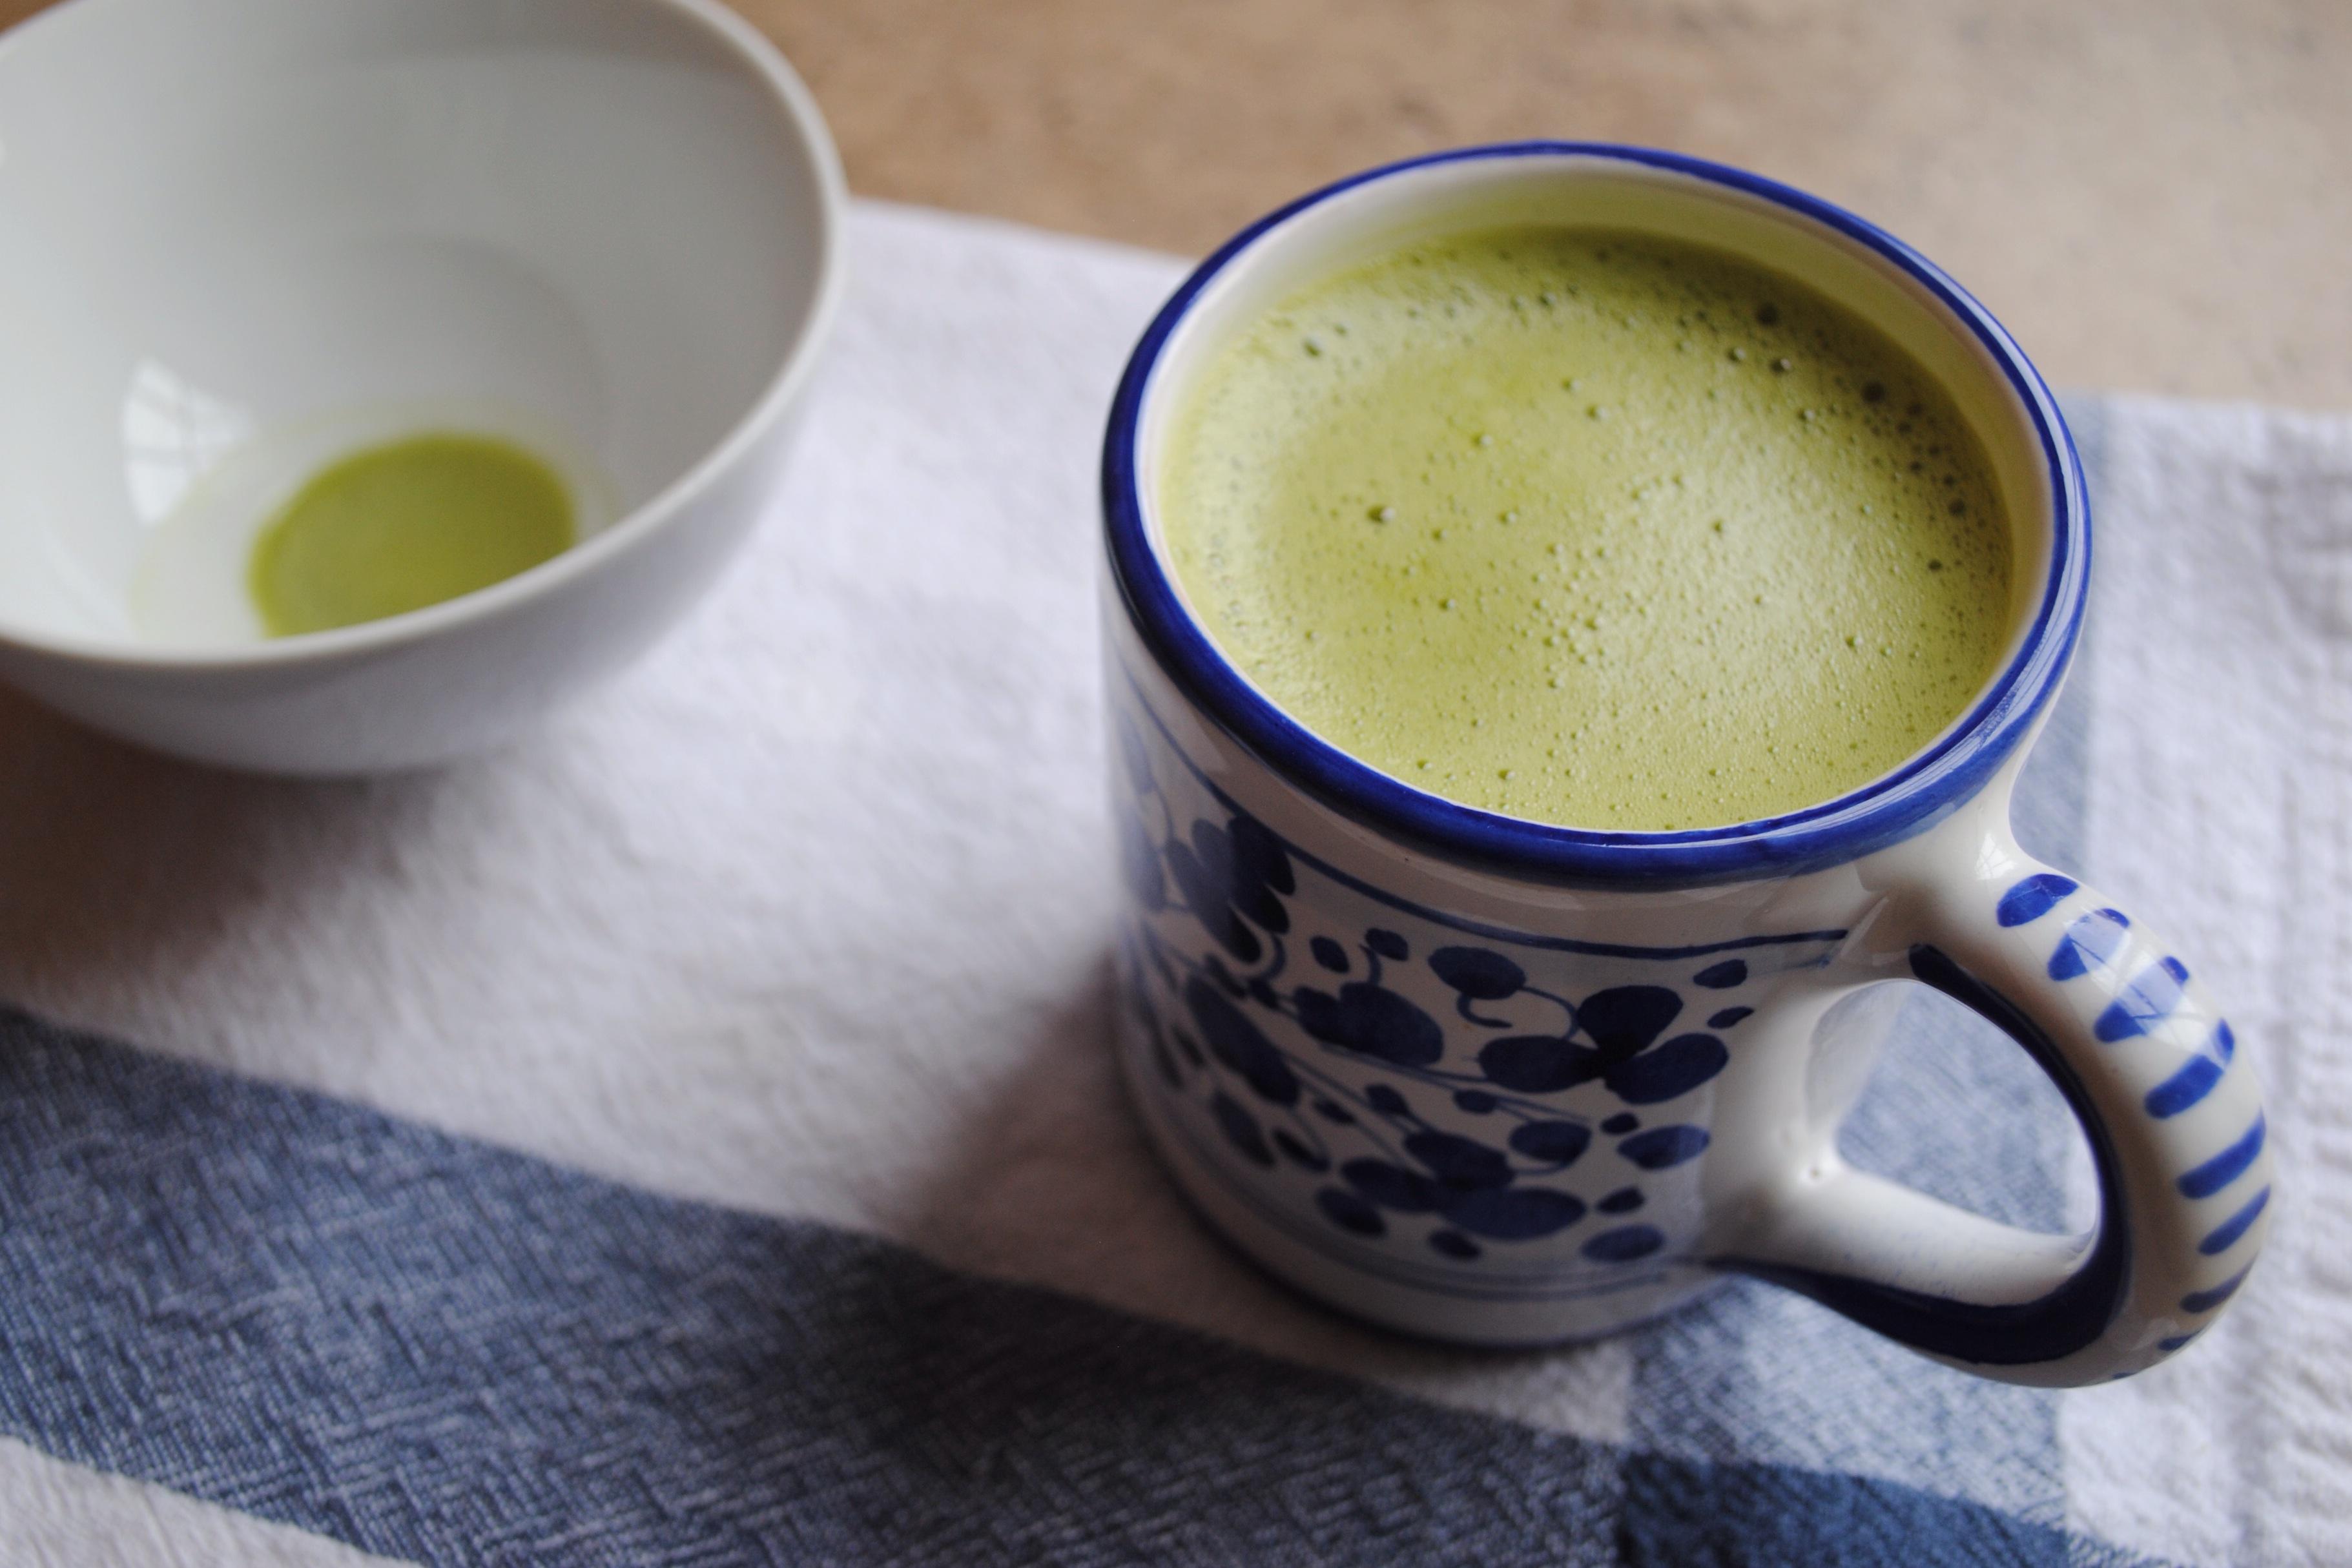 Matcha tea in a mug